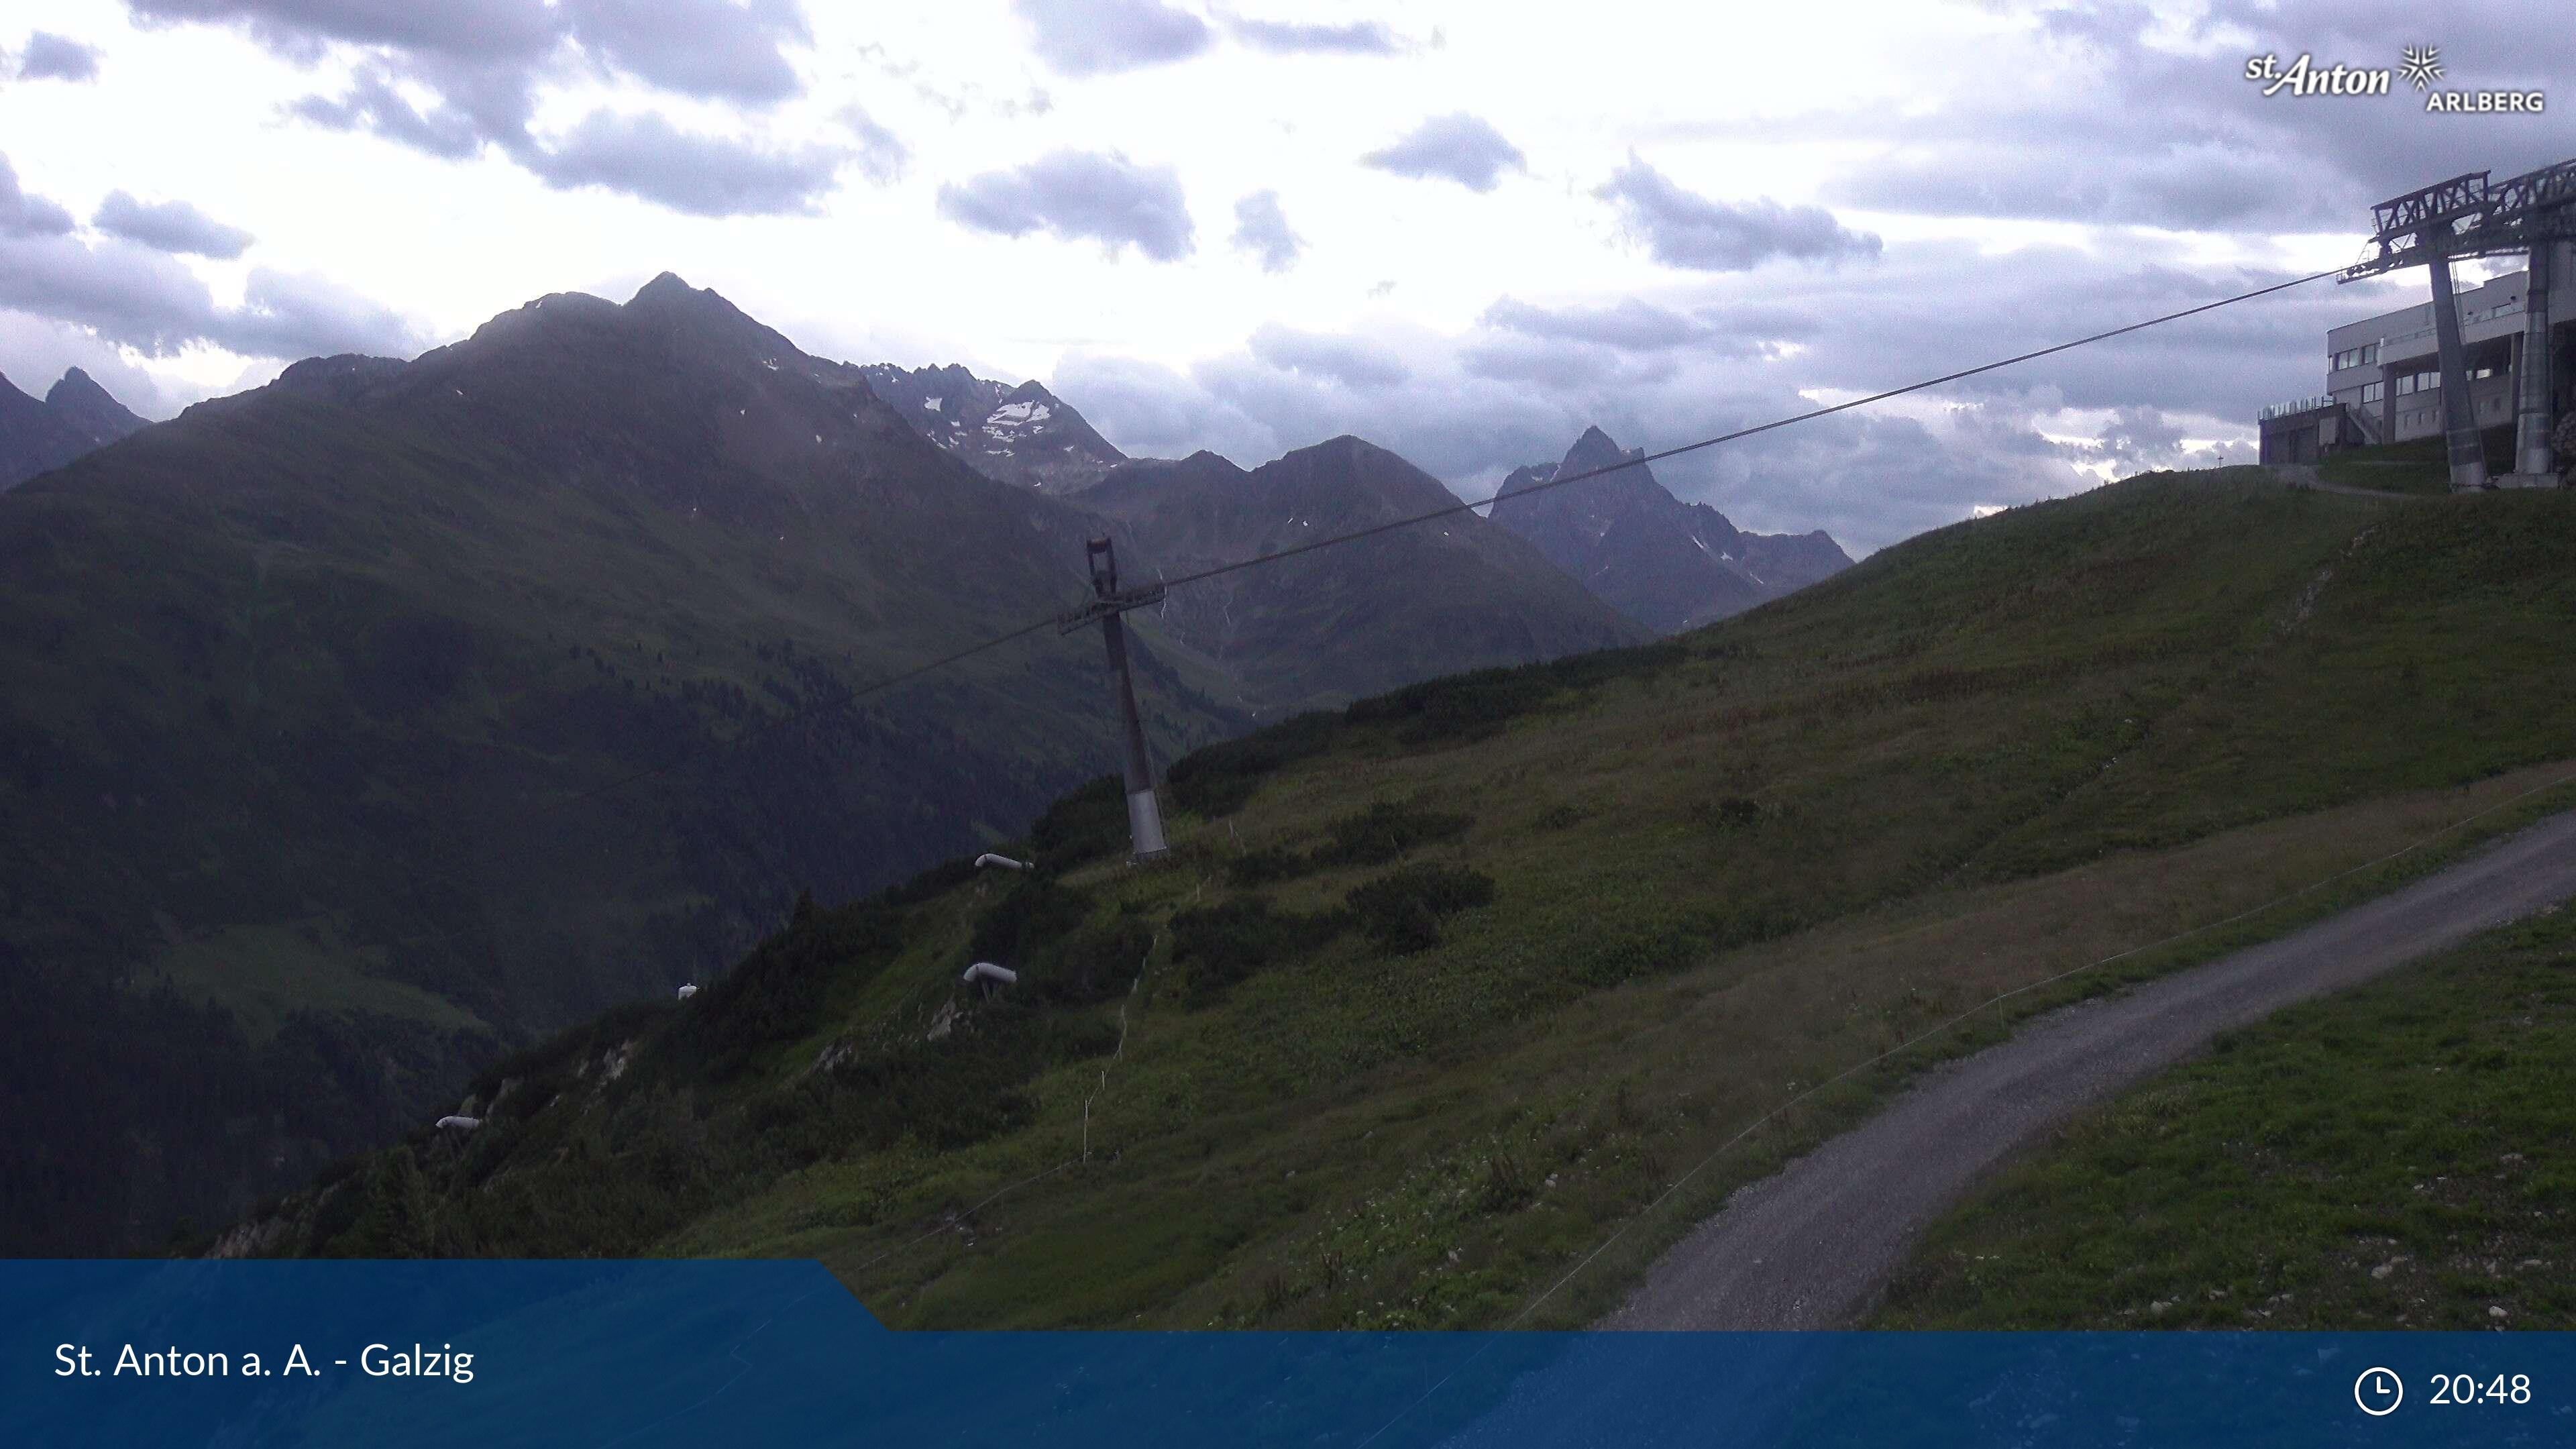 Webcam en Galzig, St. Anton am Arlberg (Austria)